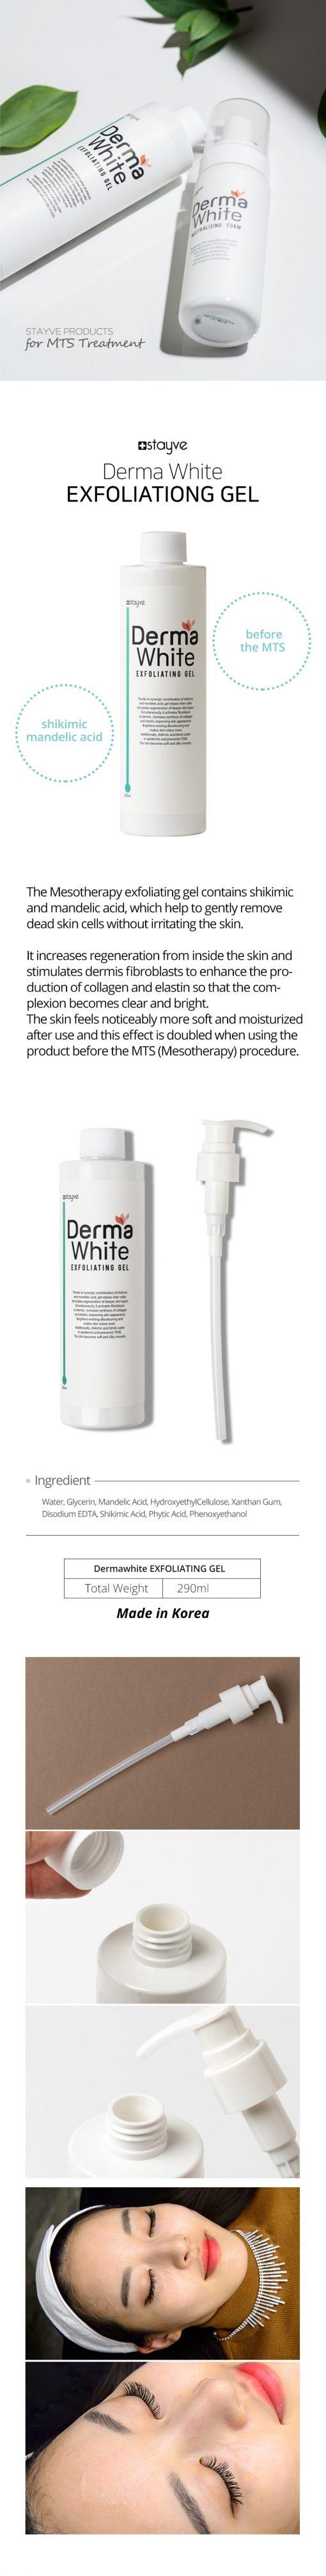 Dry Skin Remover | Dead Skin Remover | Stayve Exfoliating Gel